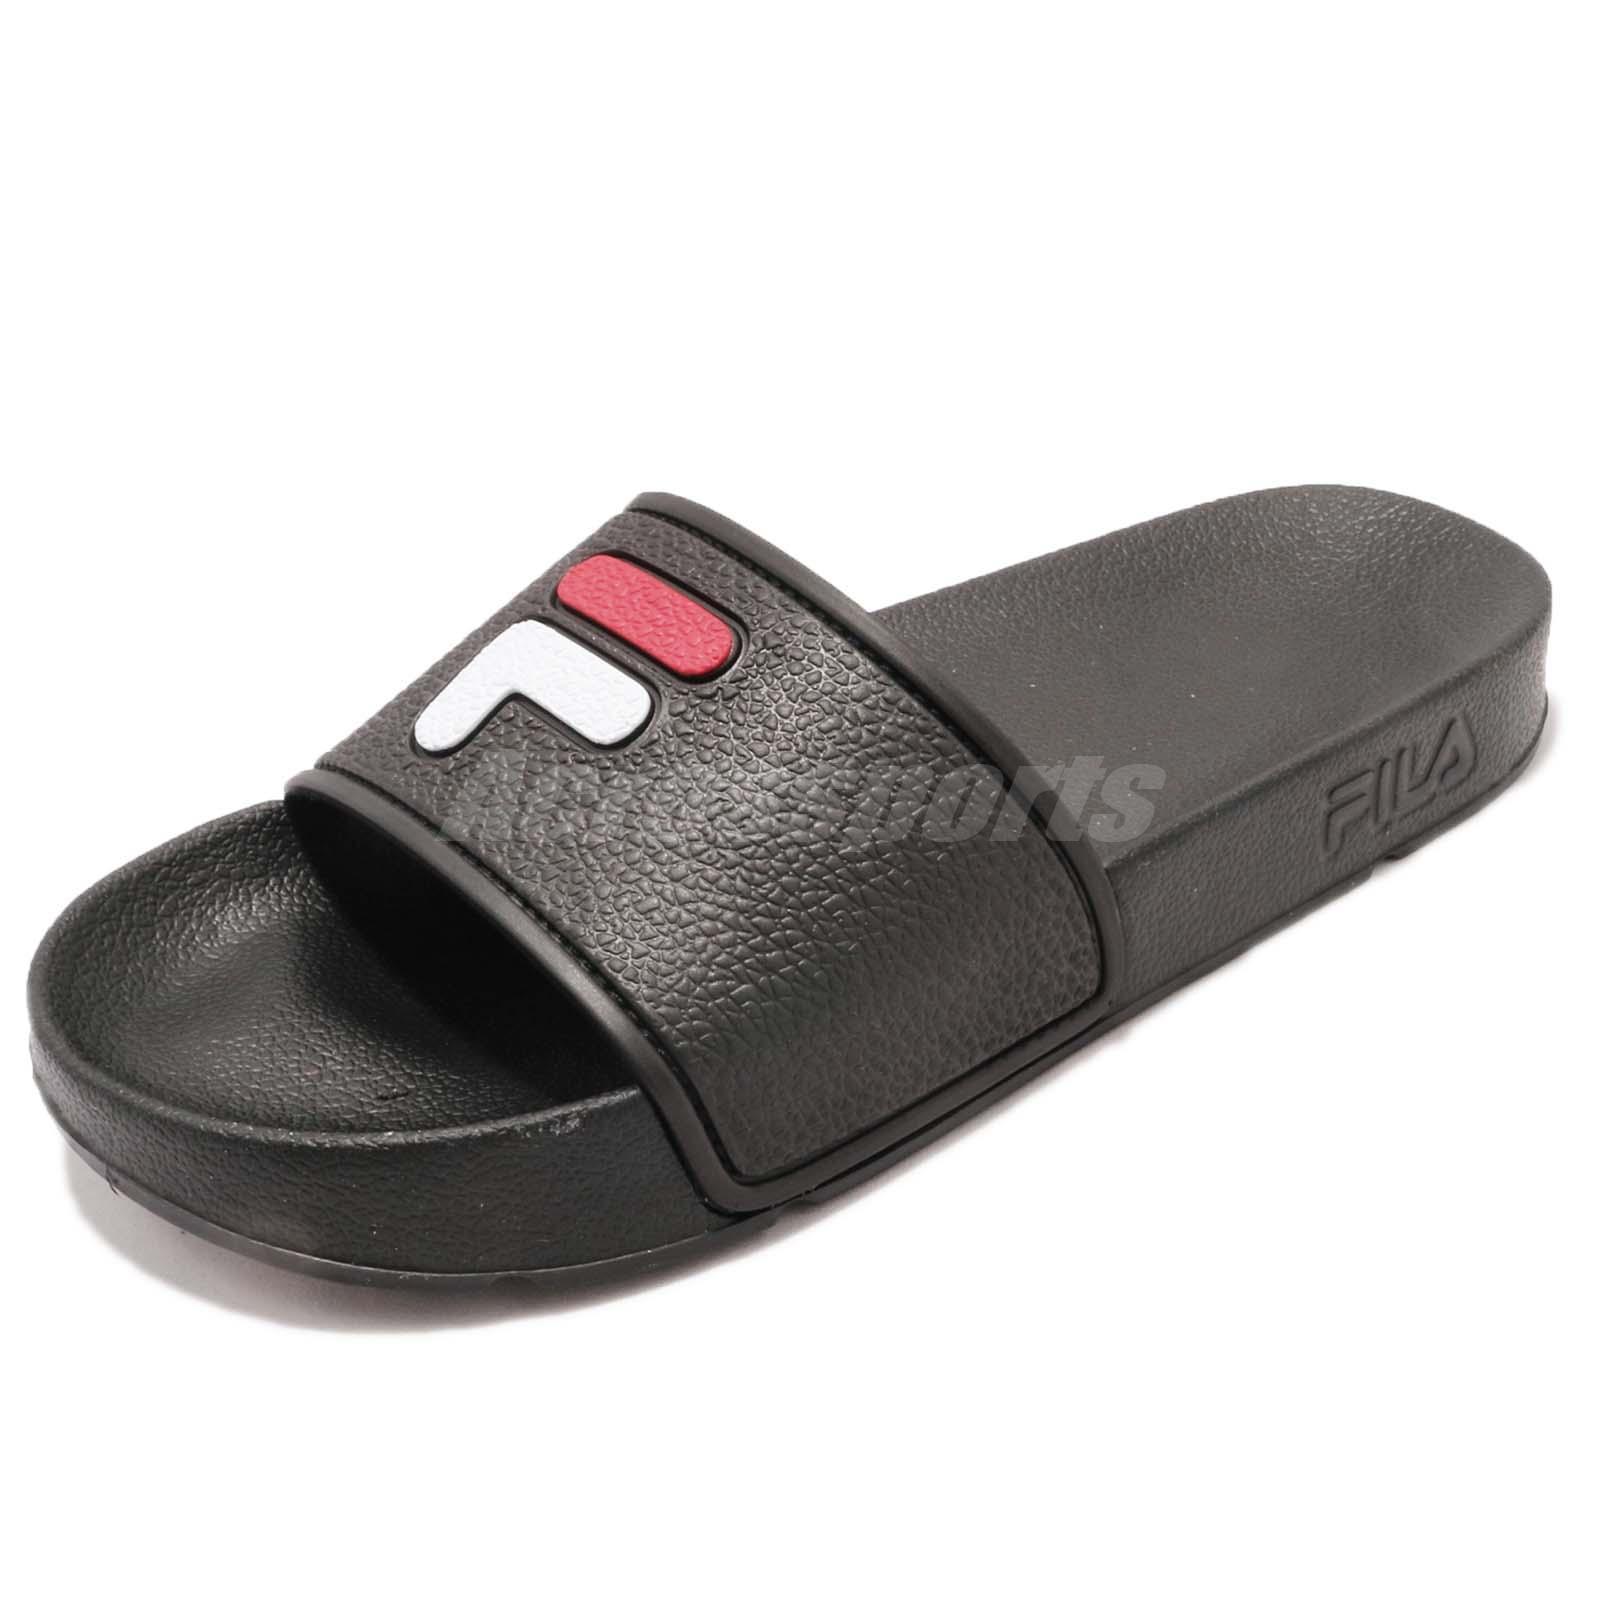 84f24155d93eb Fila S316S Logo Black Red White Rubber Men Women Sports Sandals Slides  Slippers